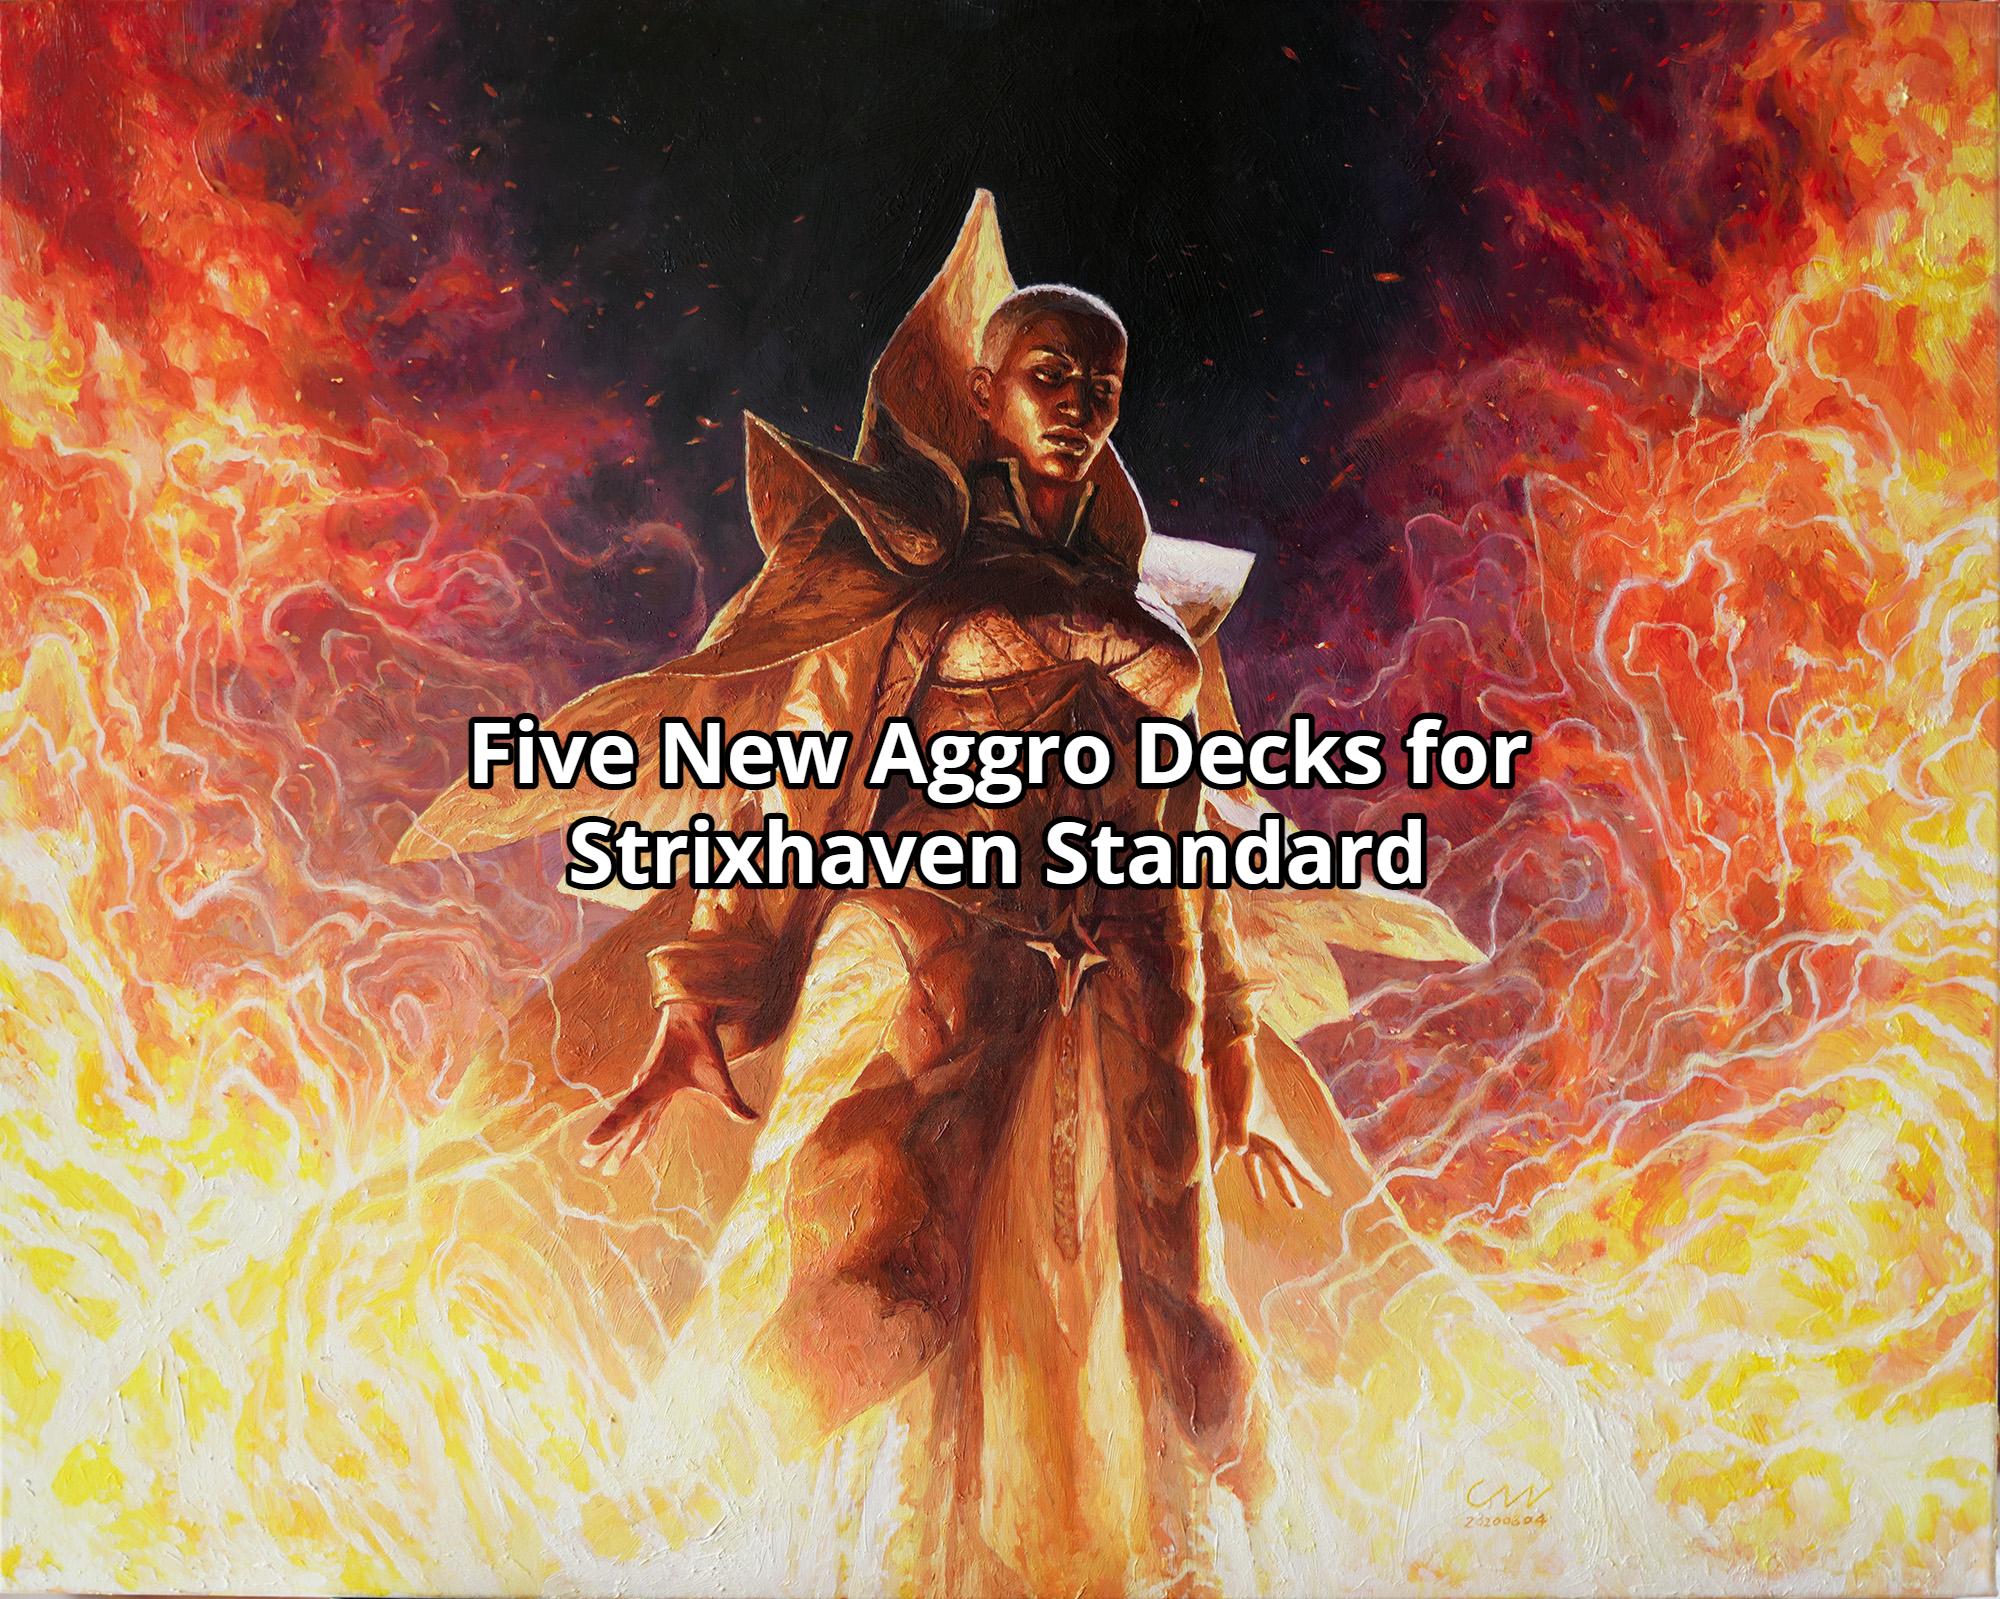 Five New Aggro Decks for Strixhaven Standard